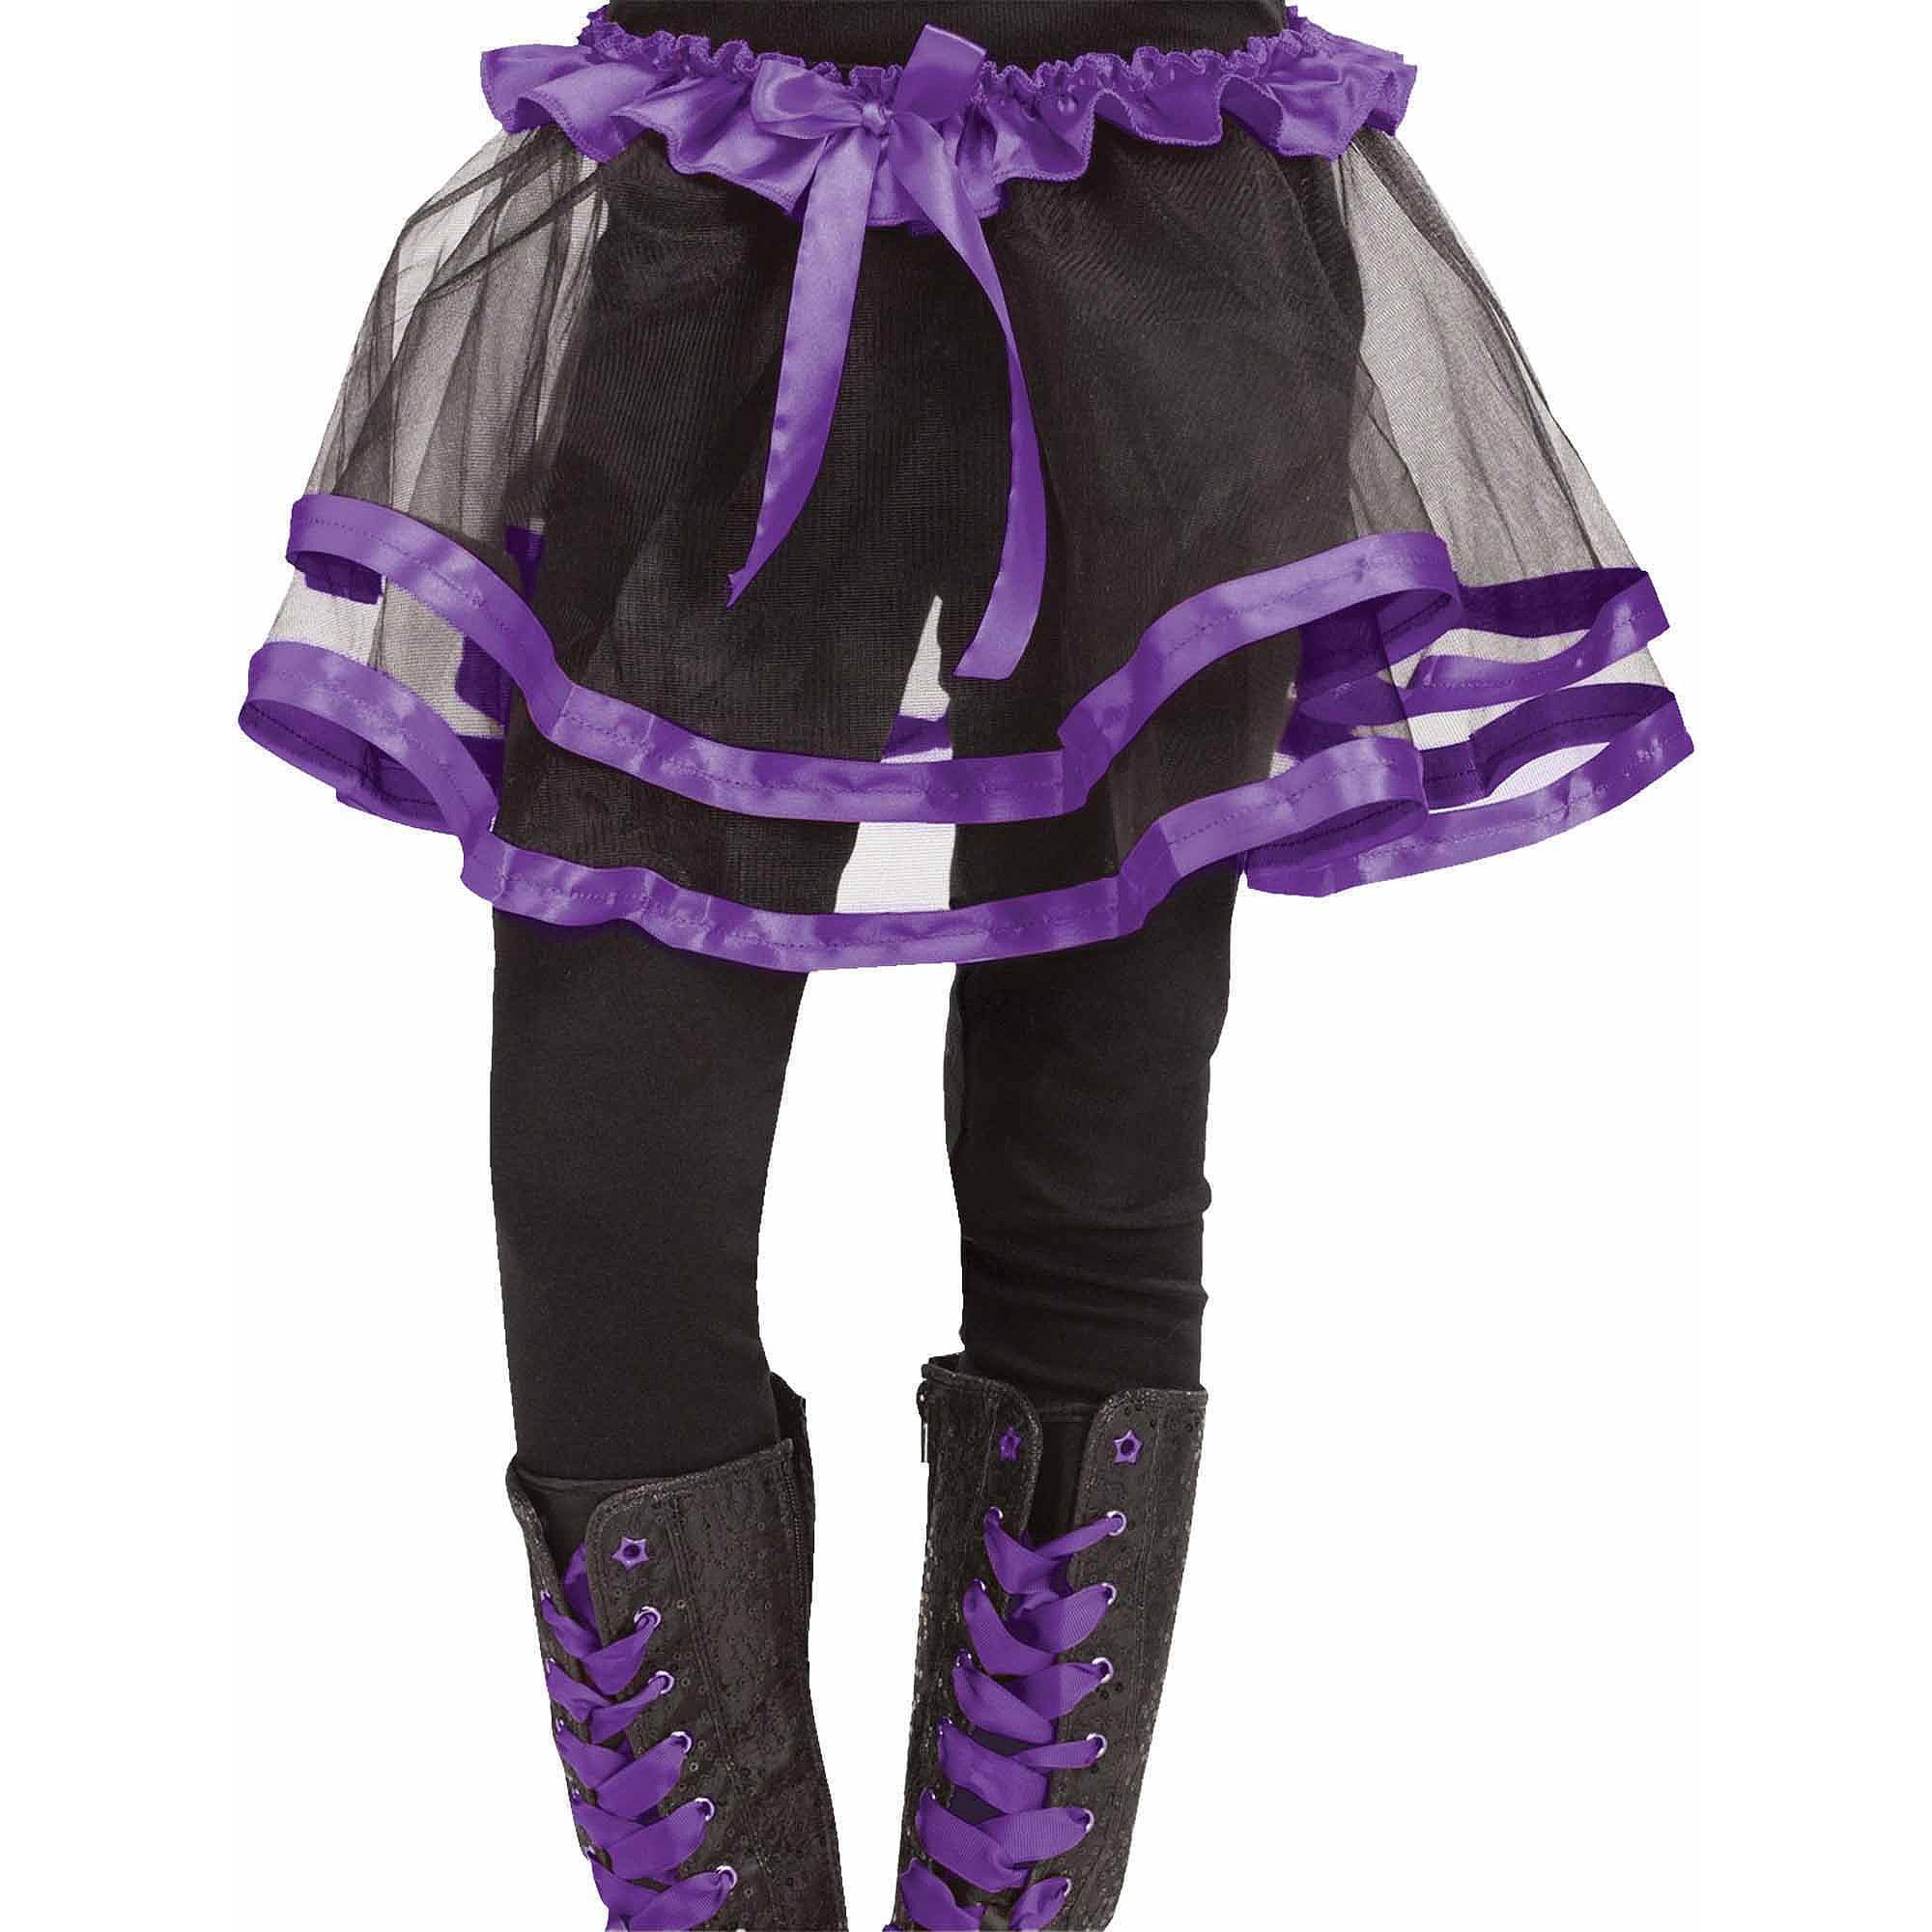 Ribbon Tutu Child Halloween Accessory